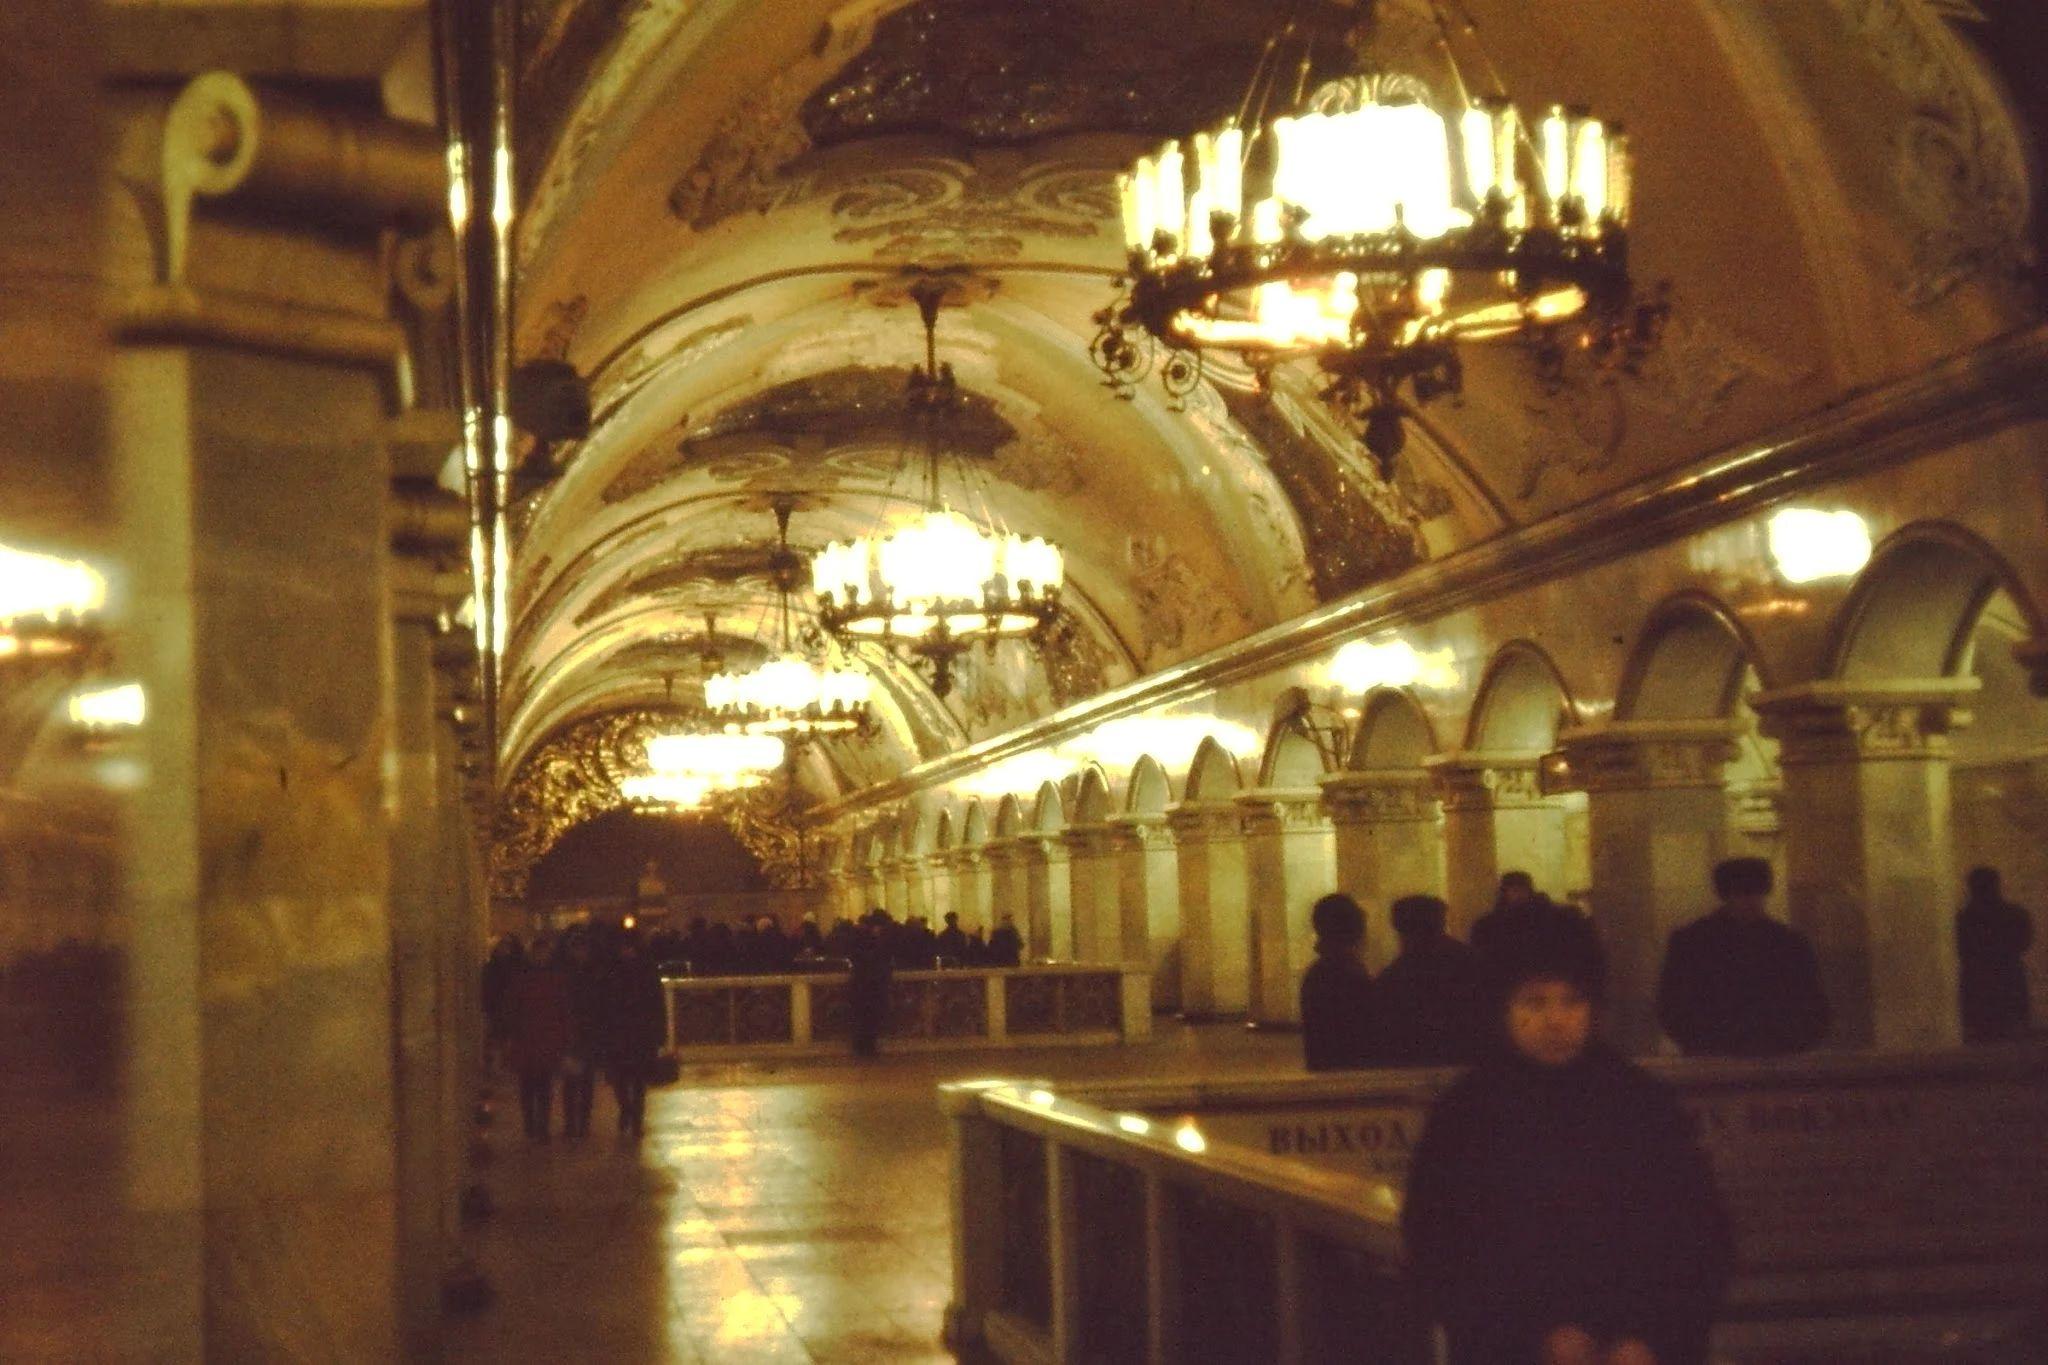 08. Станция метро. Барокко